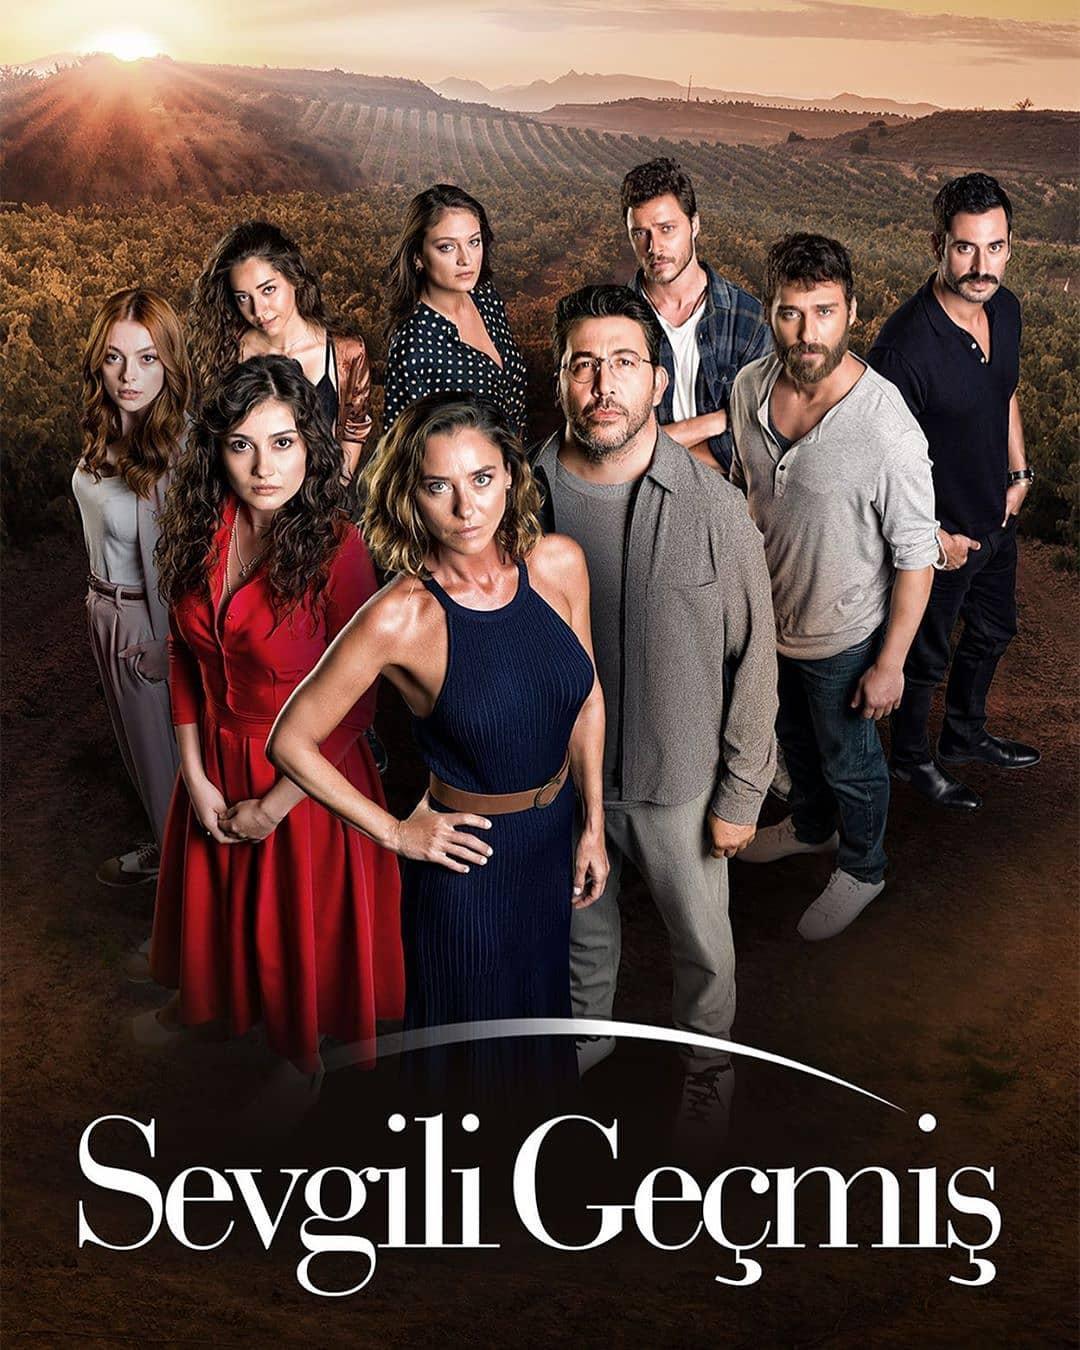 Sevgili Geçmis (TV Series 2019) - IMDb